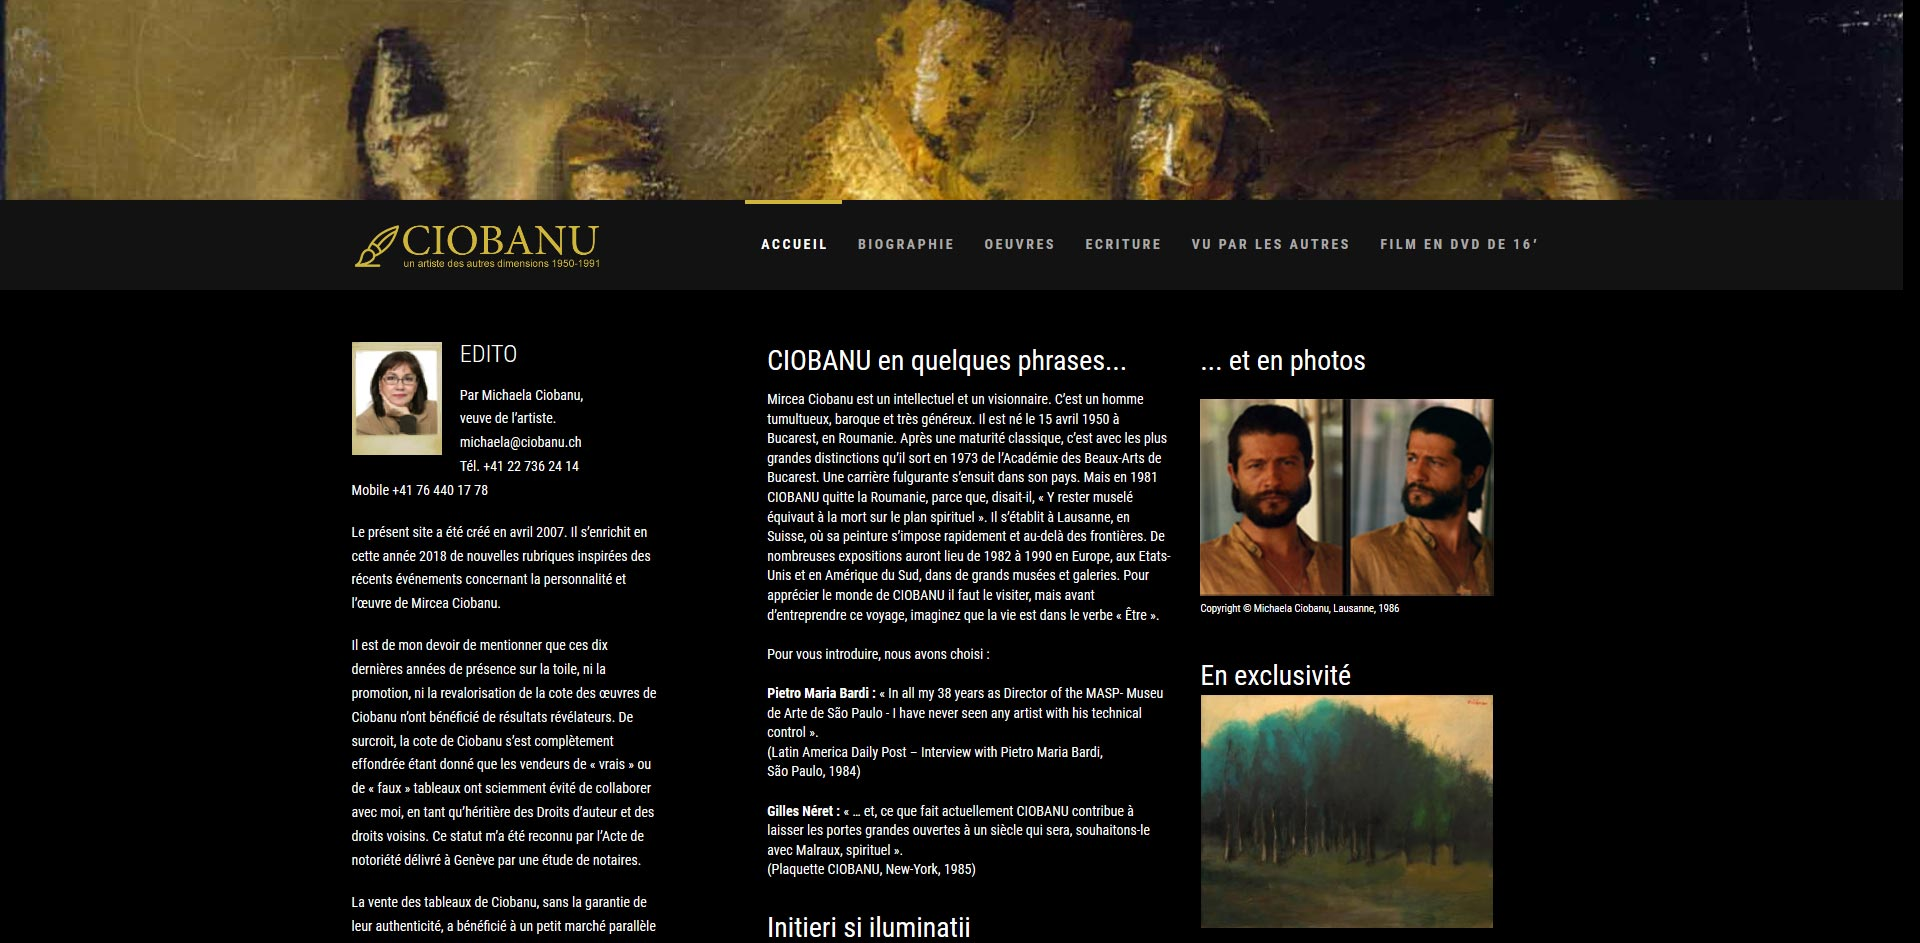 THALES IT - Réalisation sites Internet - Mircea Ciobanu